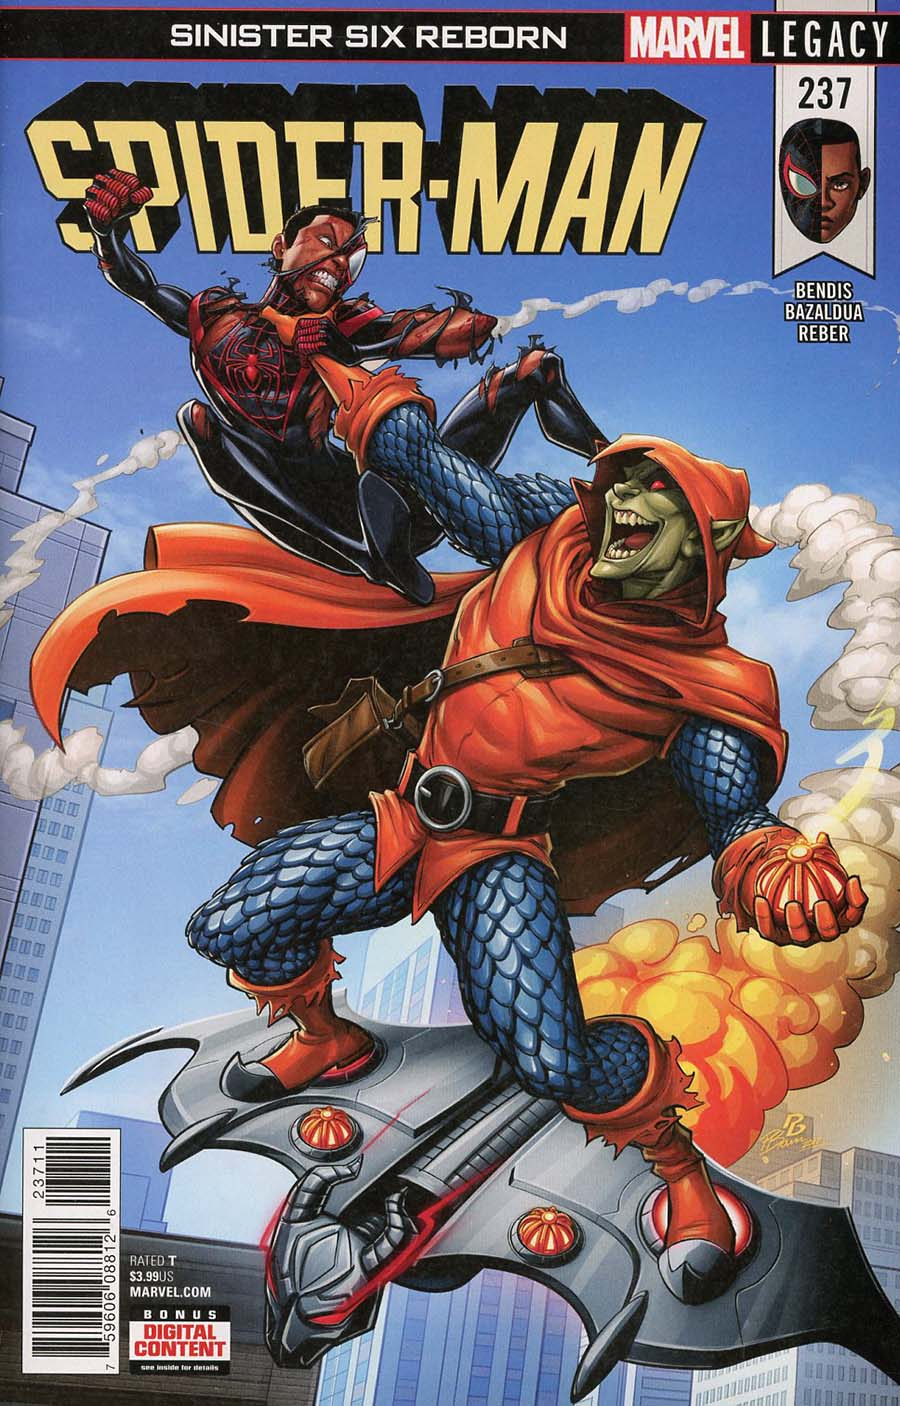 Spider-Man Vol 2 #237 (Marvel Legacy Tie-In)